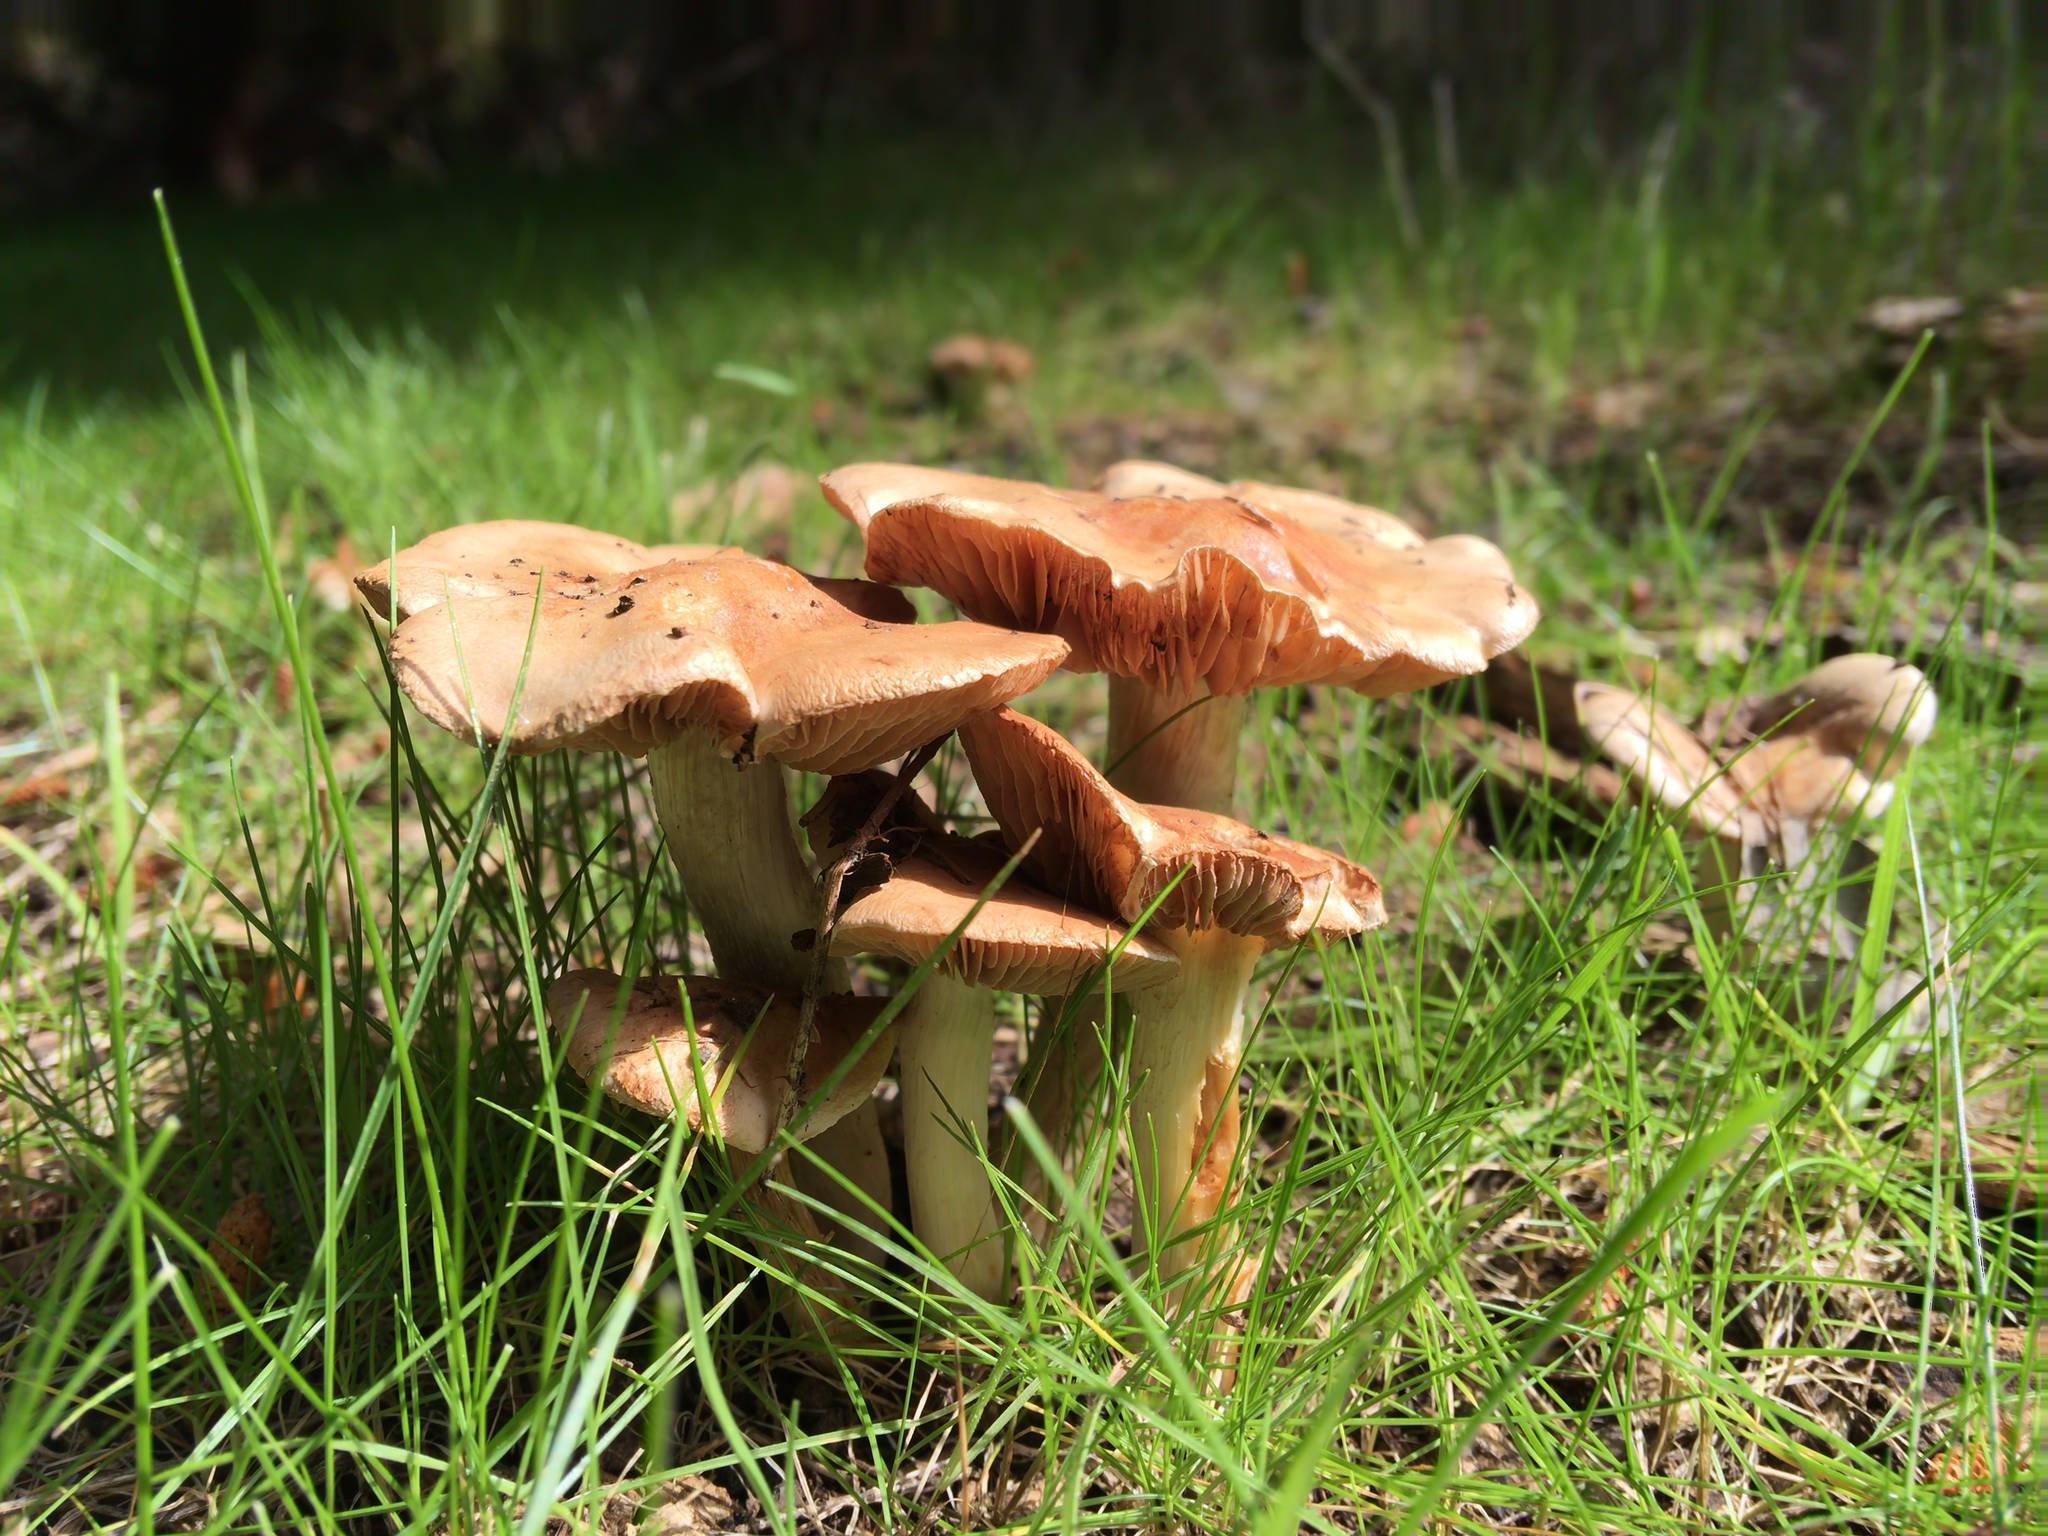 OFFICIAL* Mushrooms of BALINGUP, Western Australia - Psilocybe